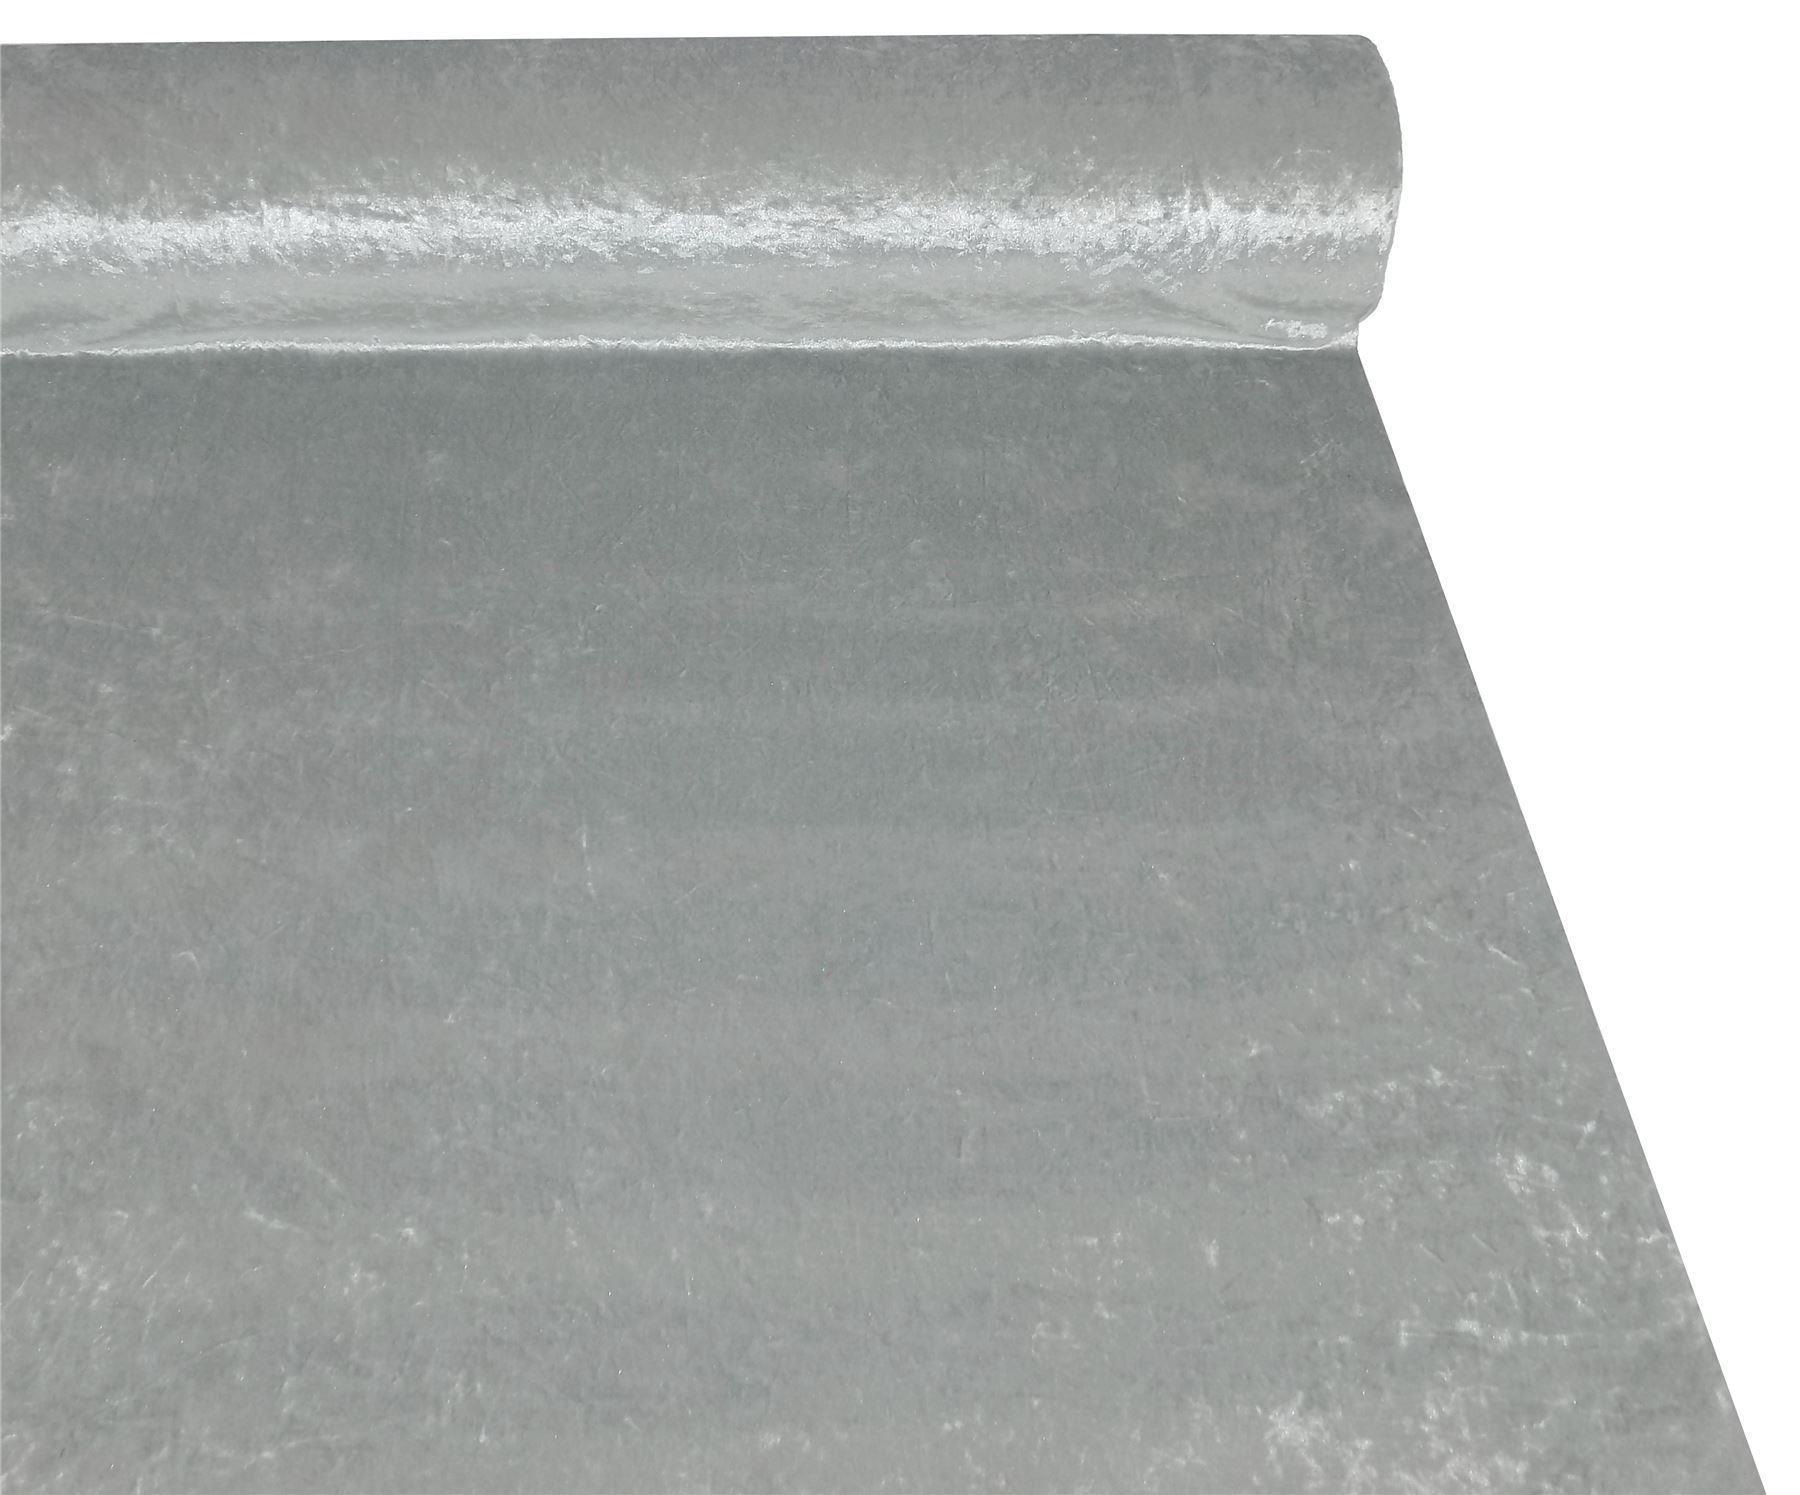 silver crushed velvet high quality fabric material 3. Black Bedroom Furniture Sets. Home Design Ideas